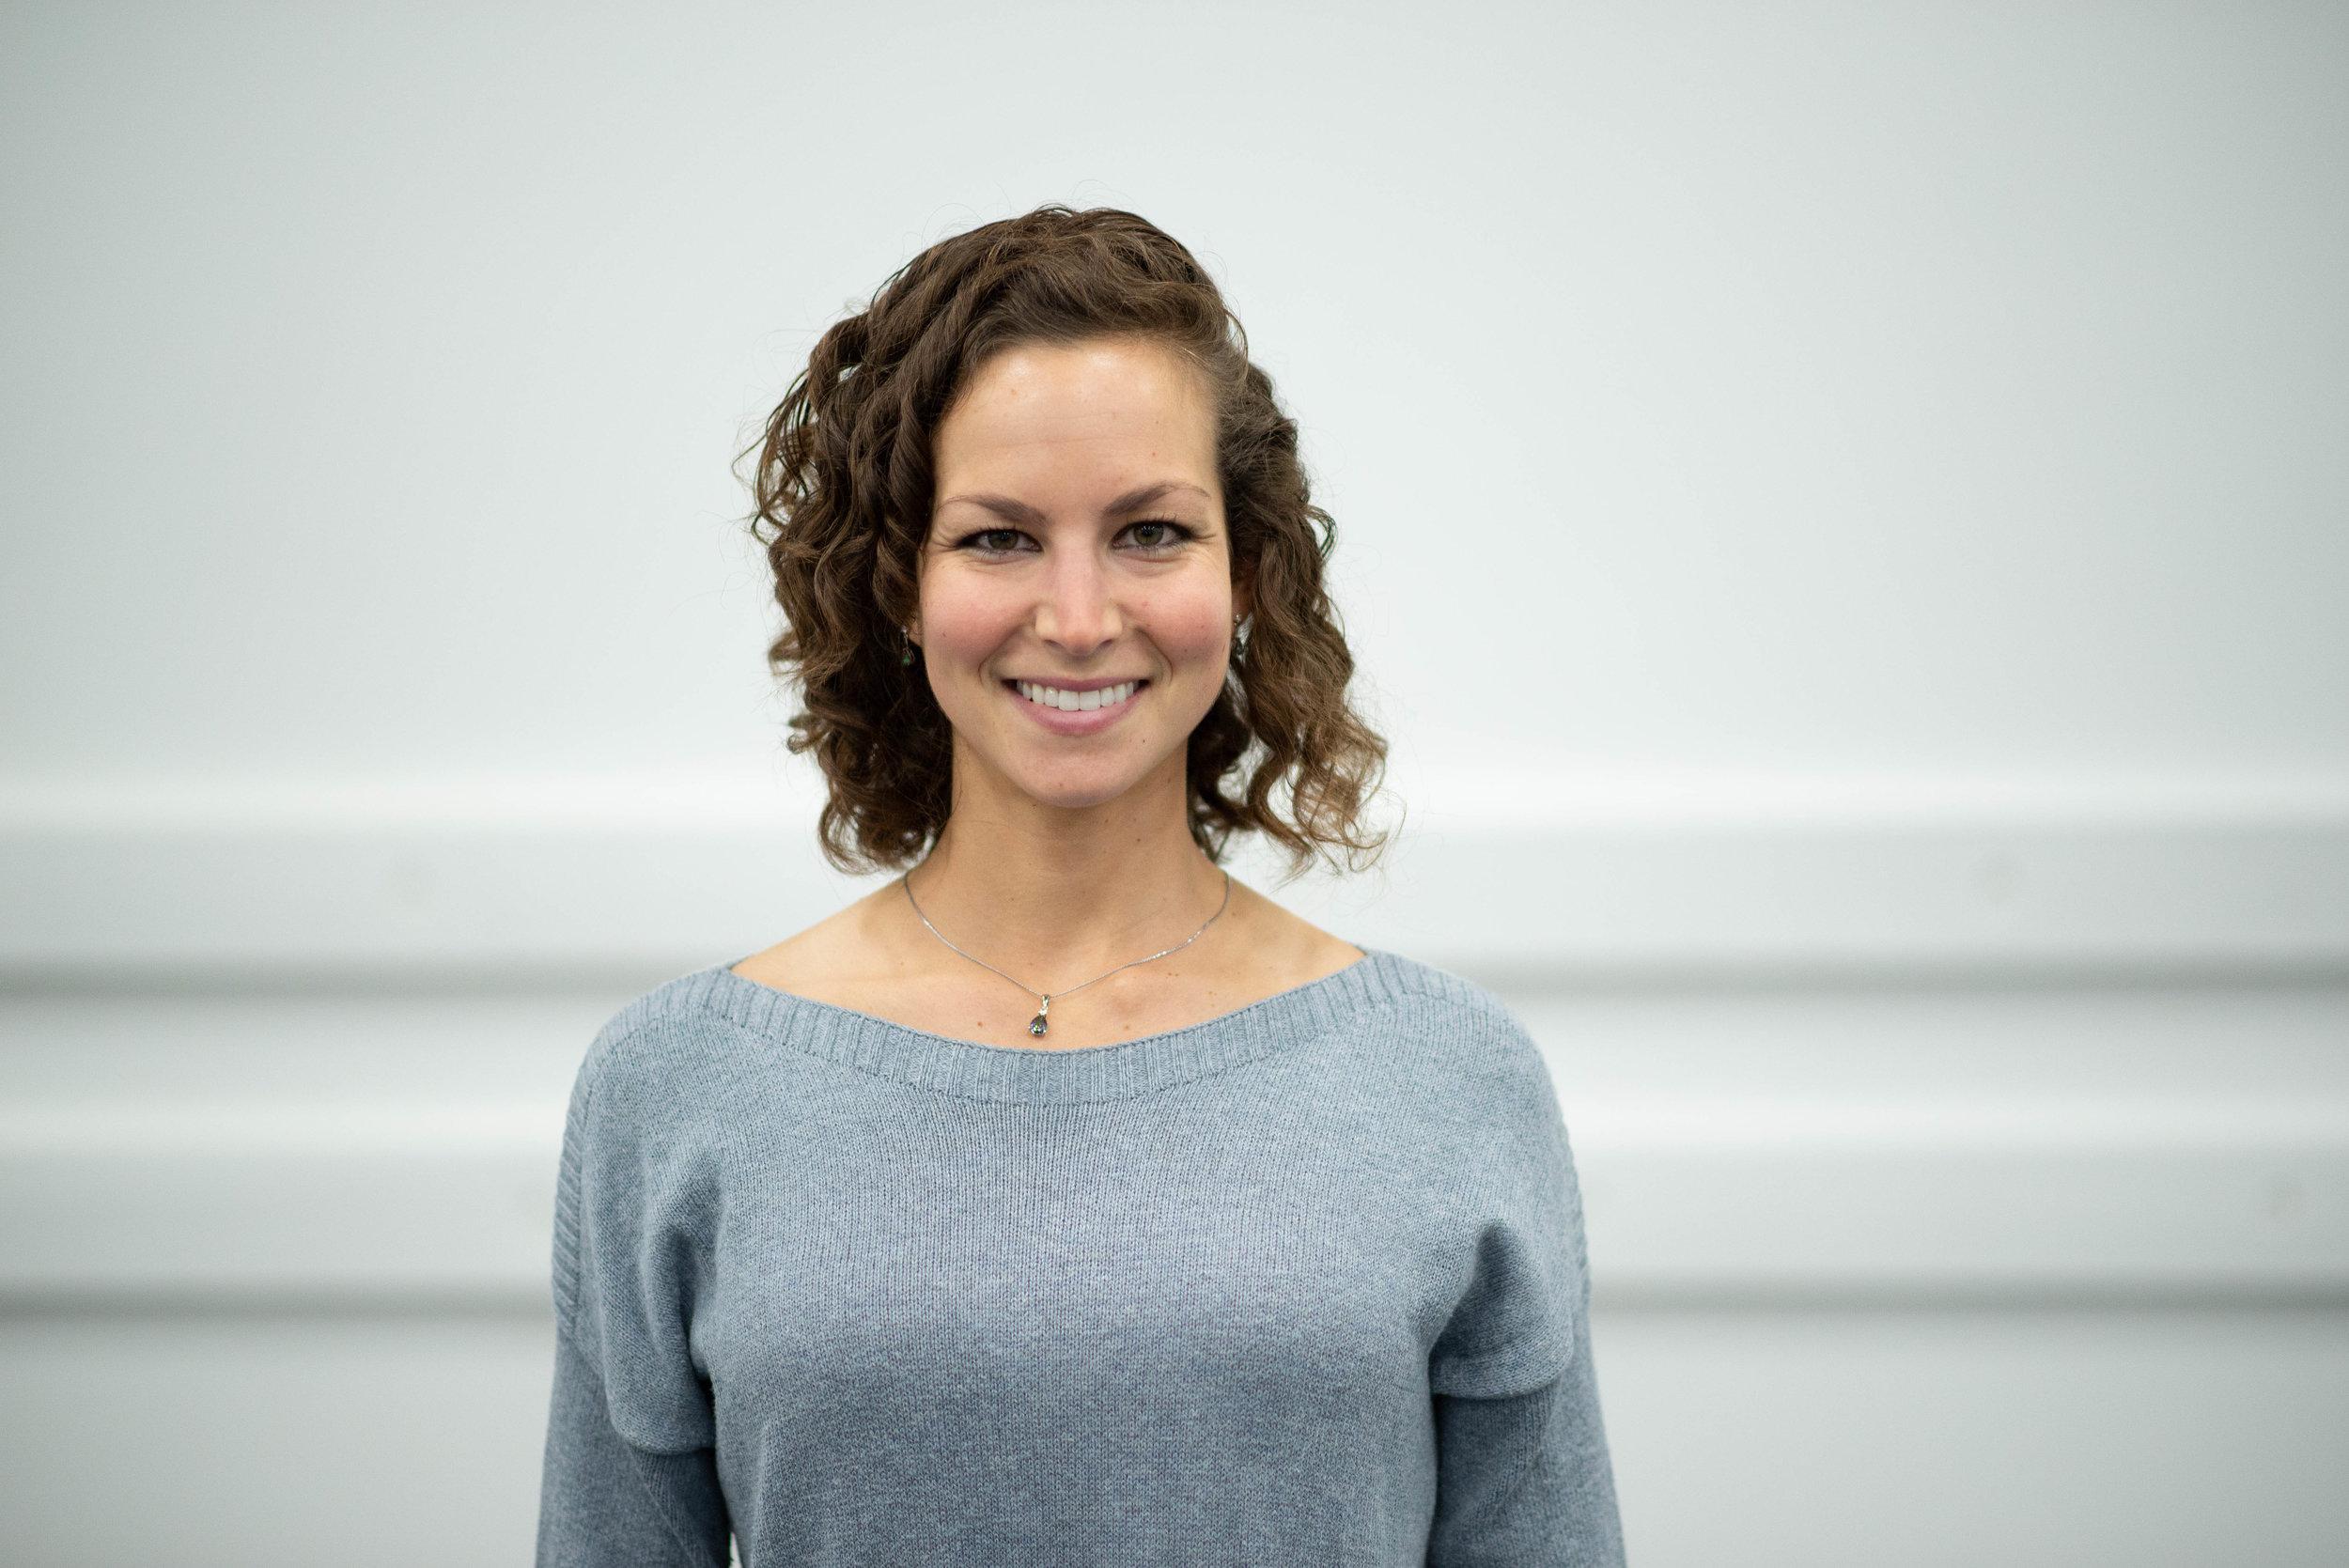 Nasira Burkholder